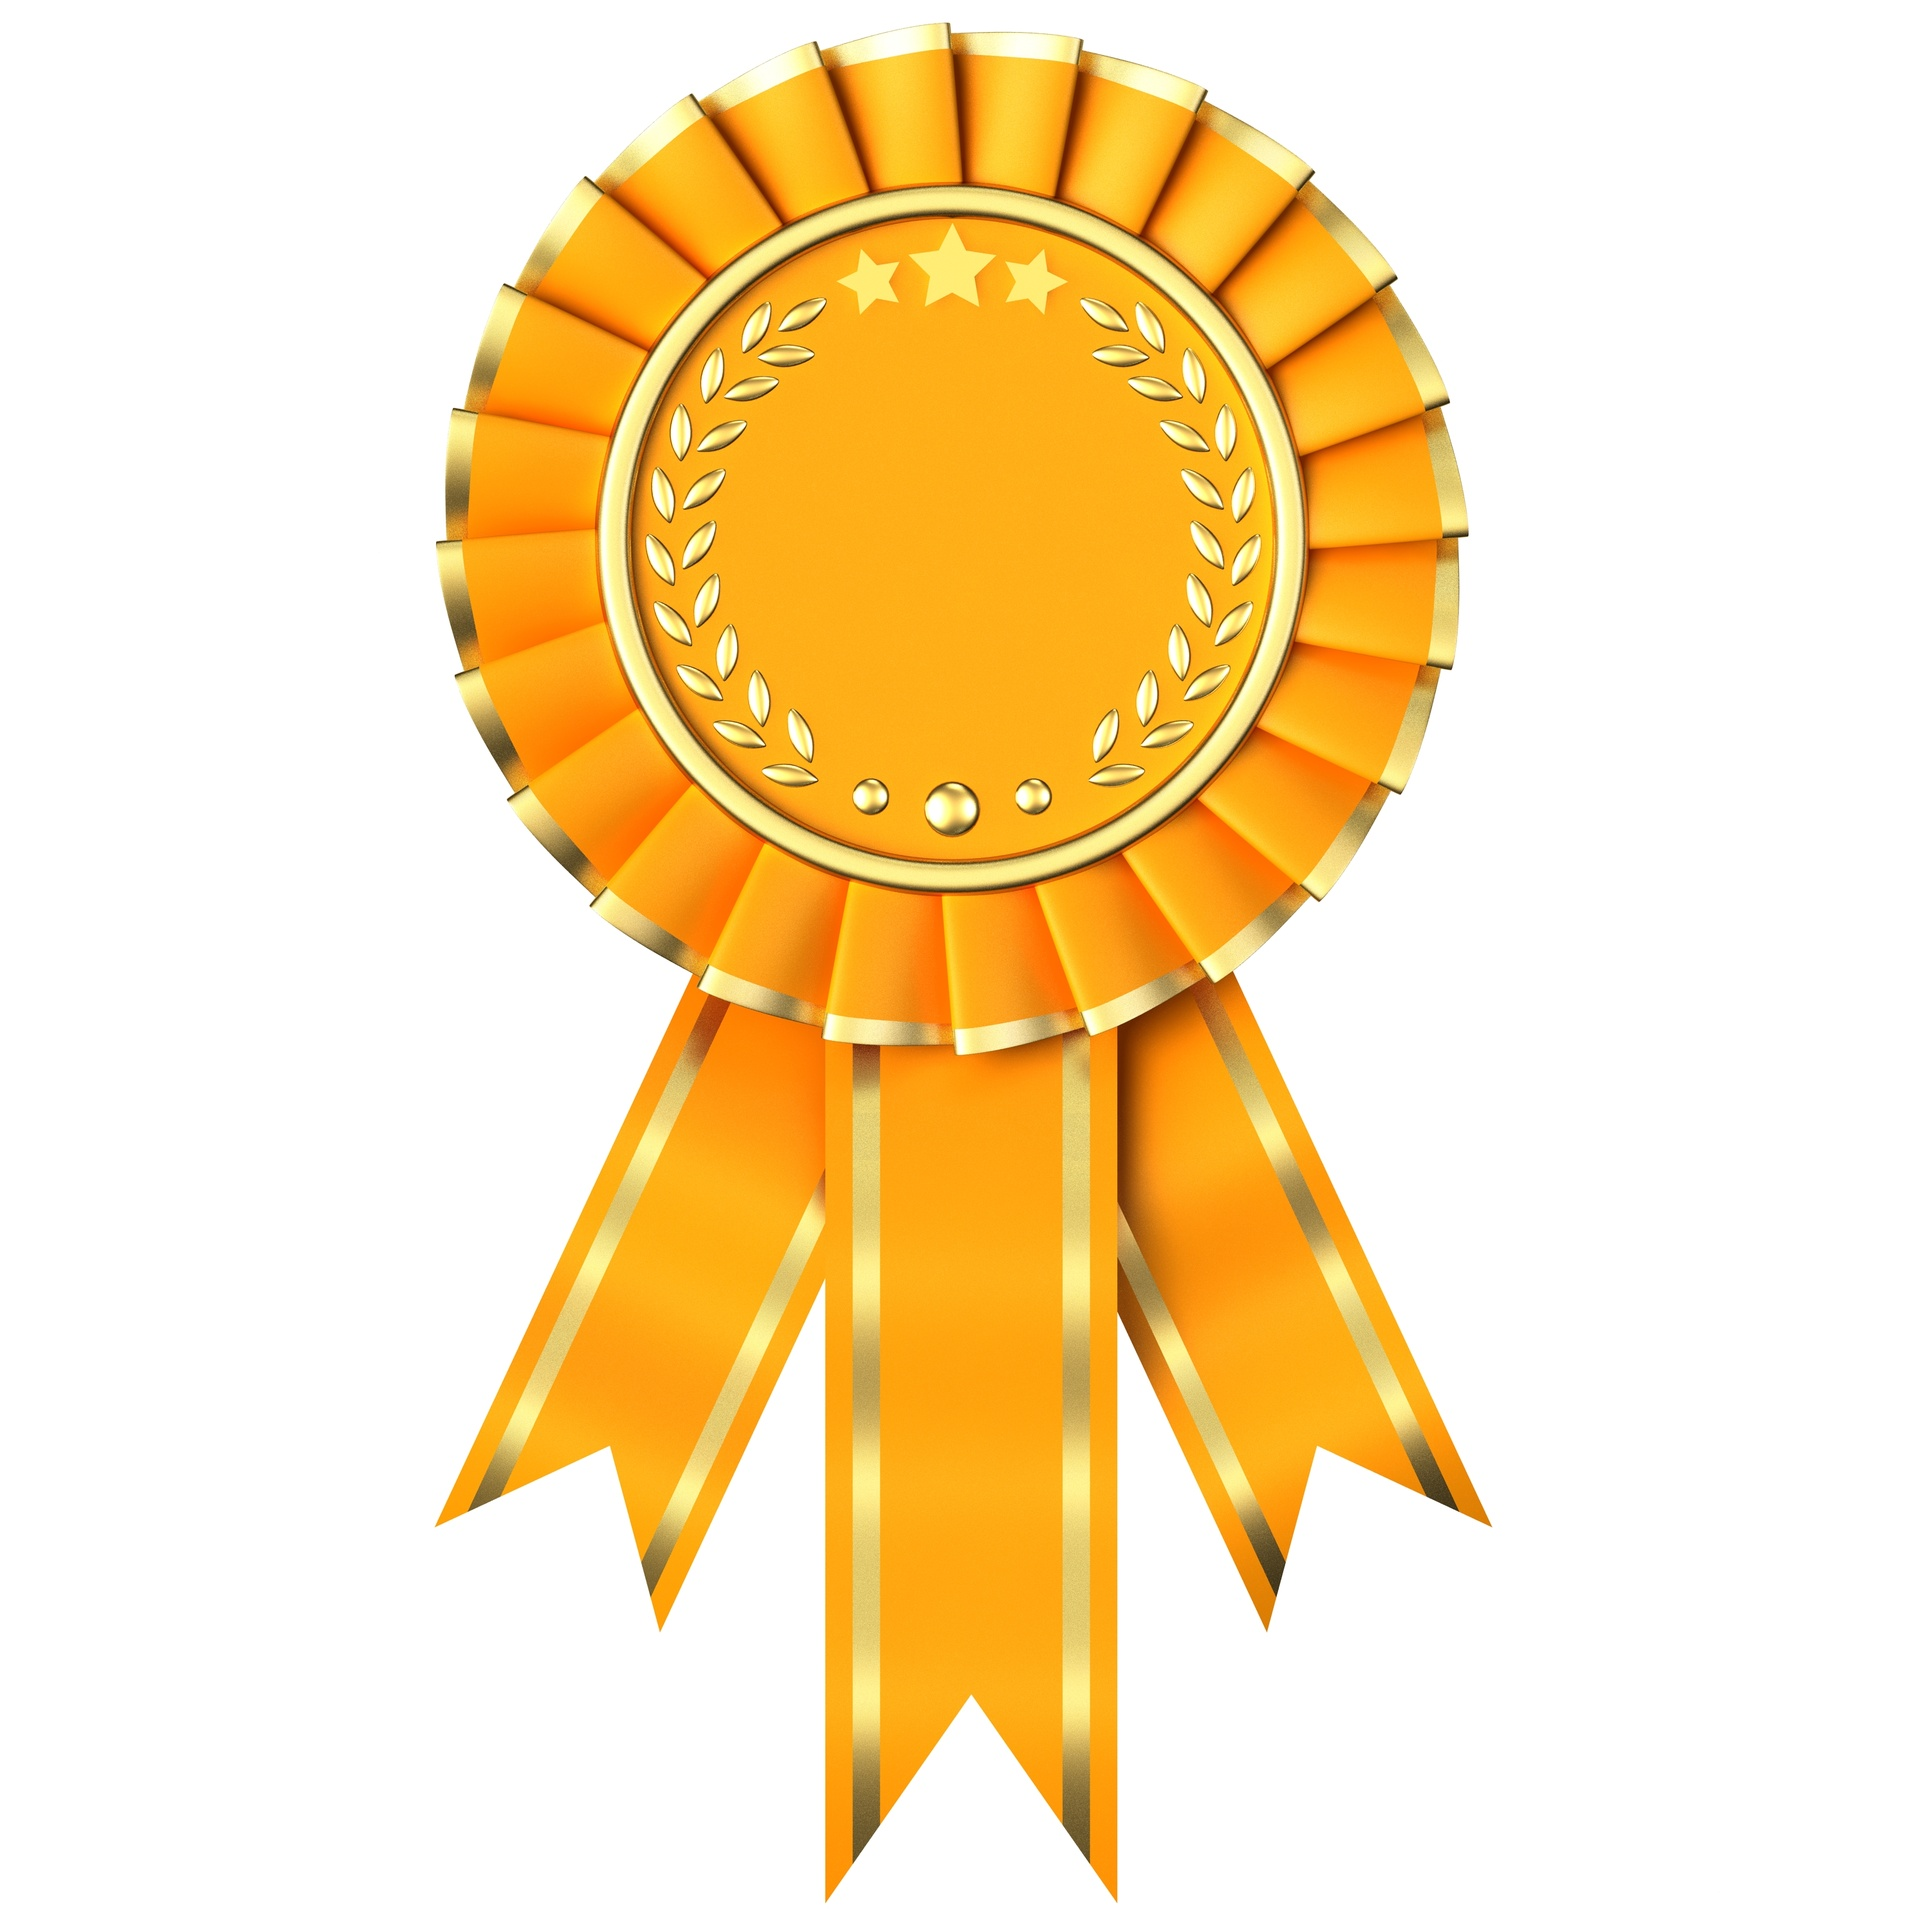 Award Winning London Pr Company   Pha Media